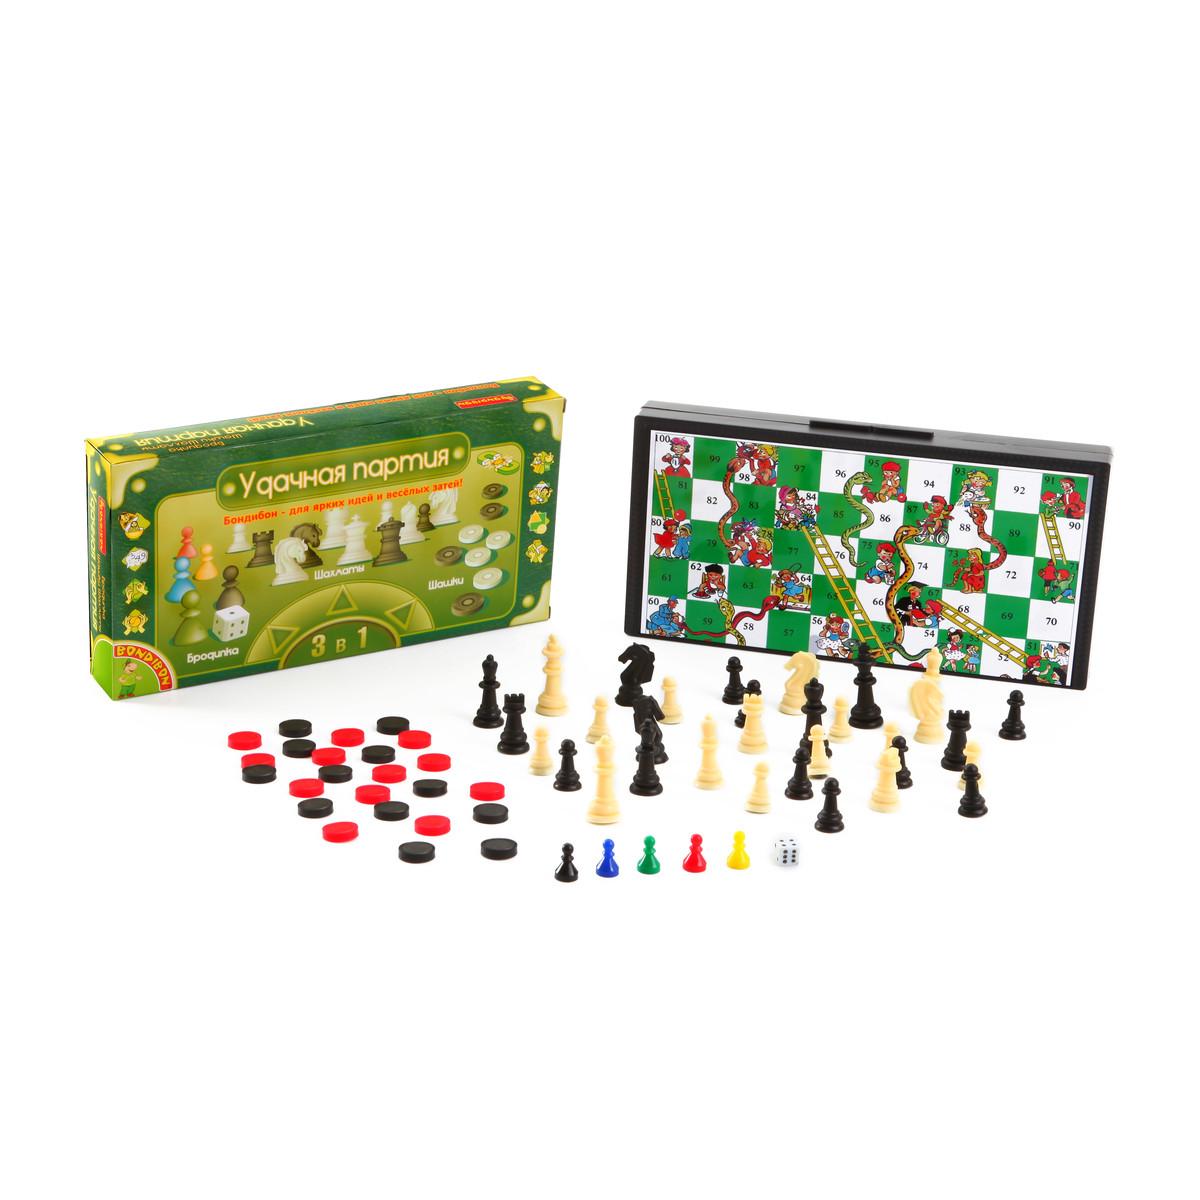 Настольная игра Bondibon Удачная партия набор шашки, шахматы, бродилка<br>